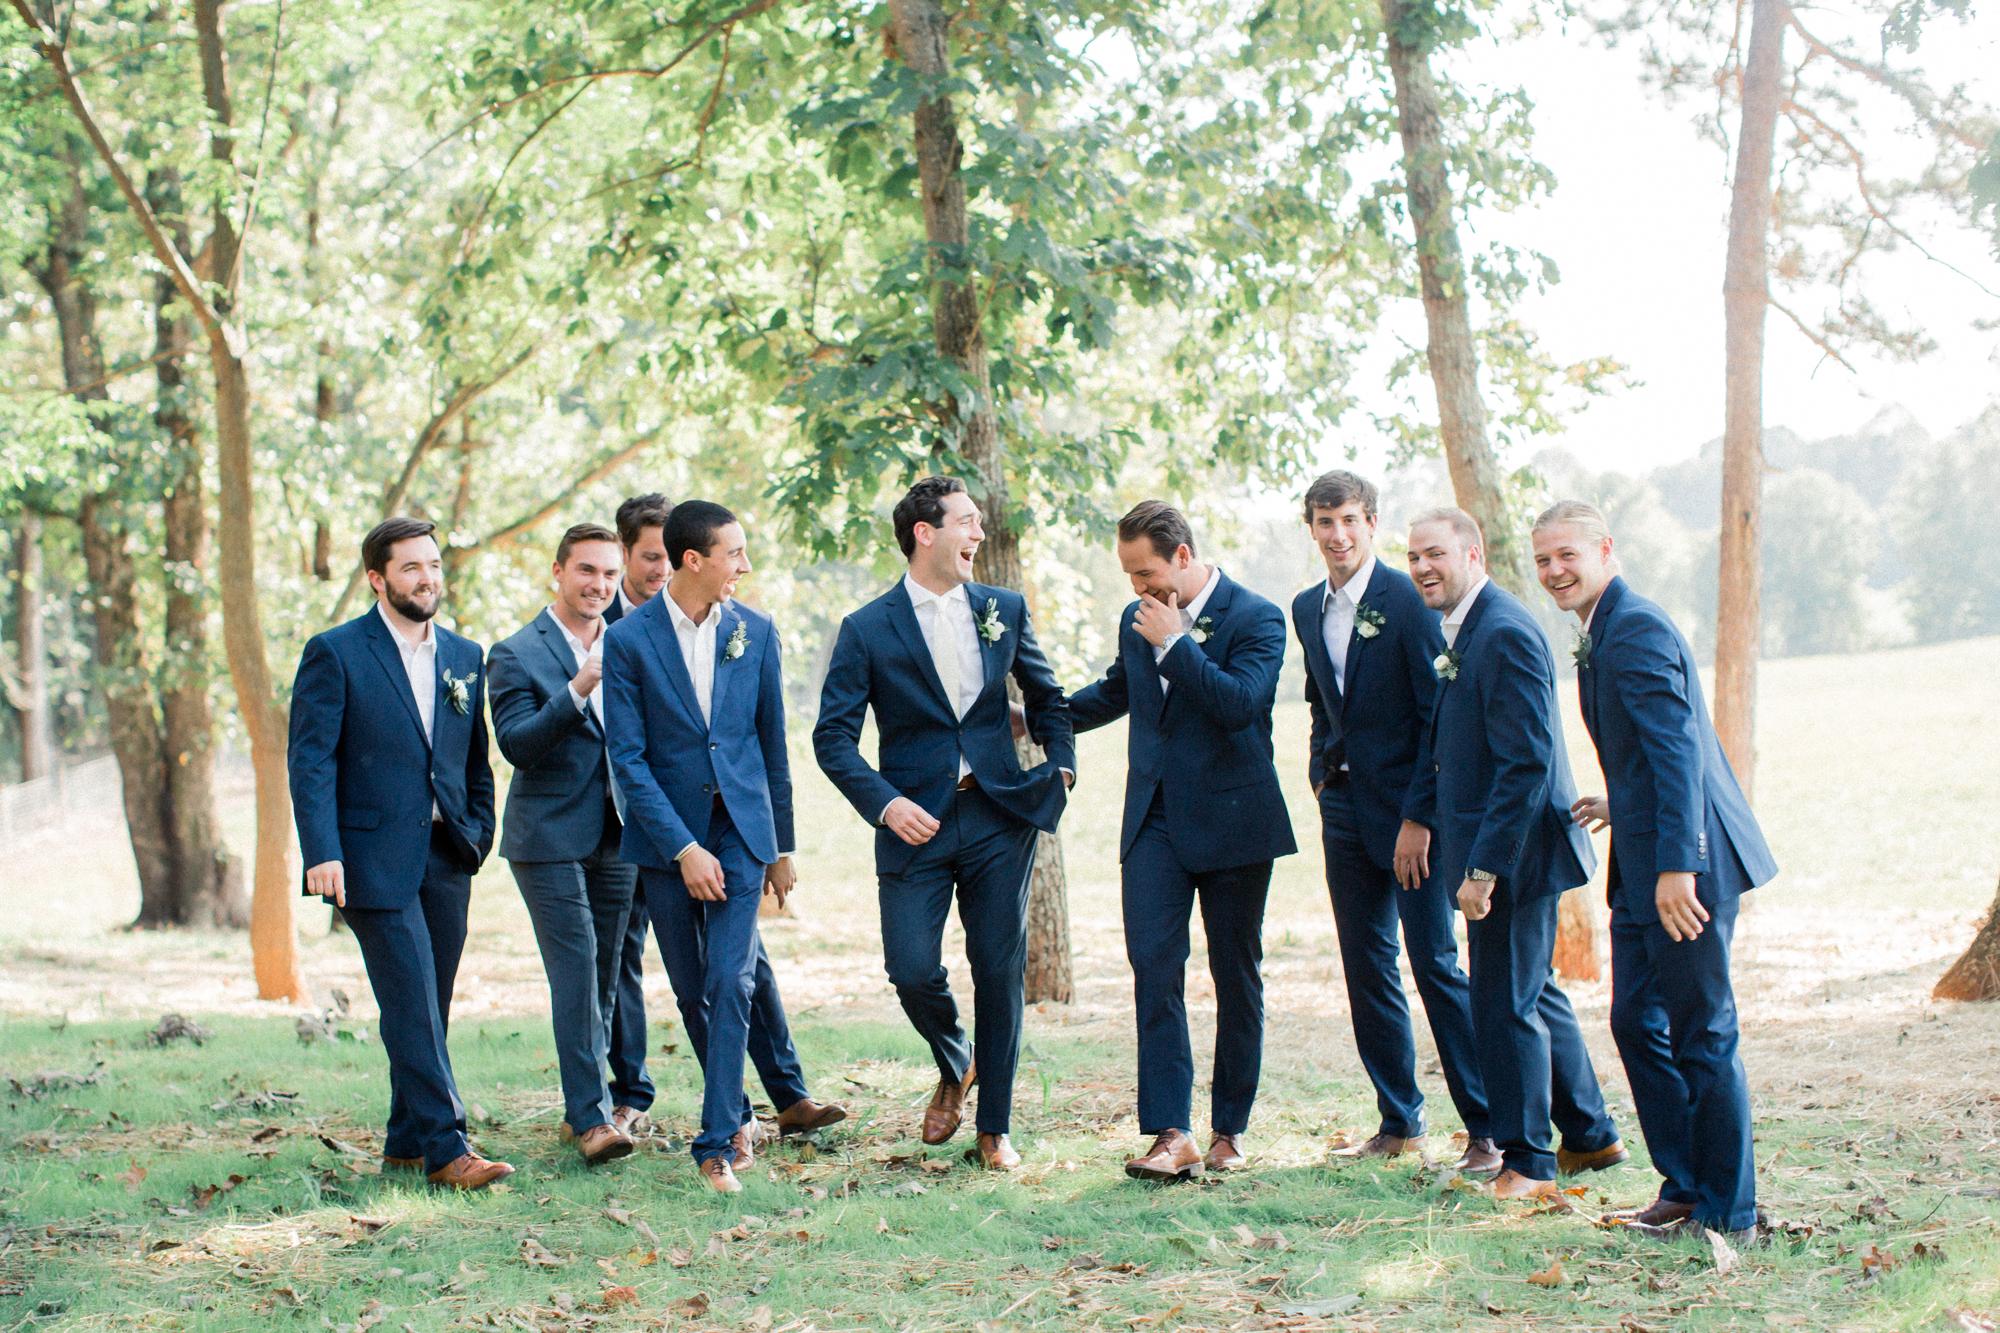 Groom interacting with groomsmen